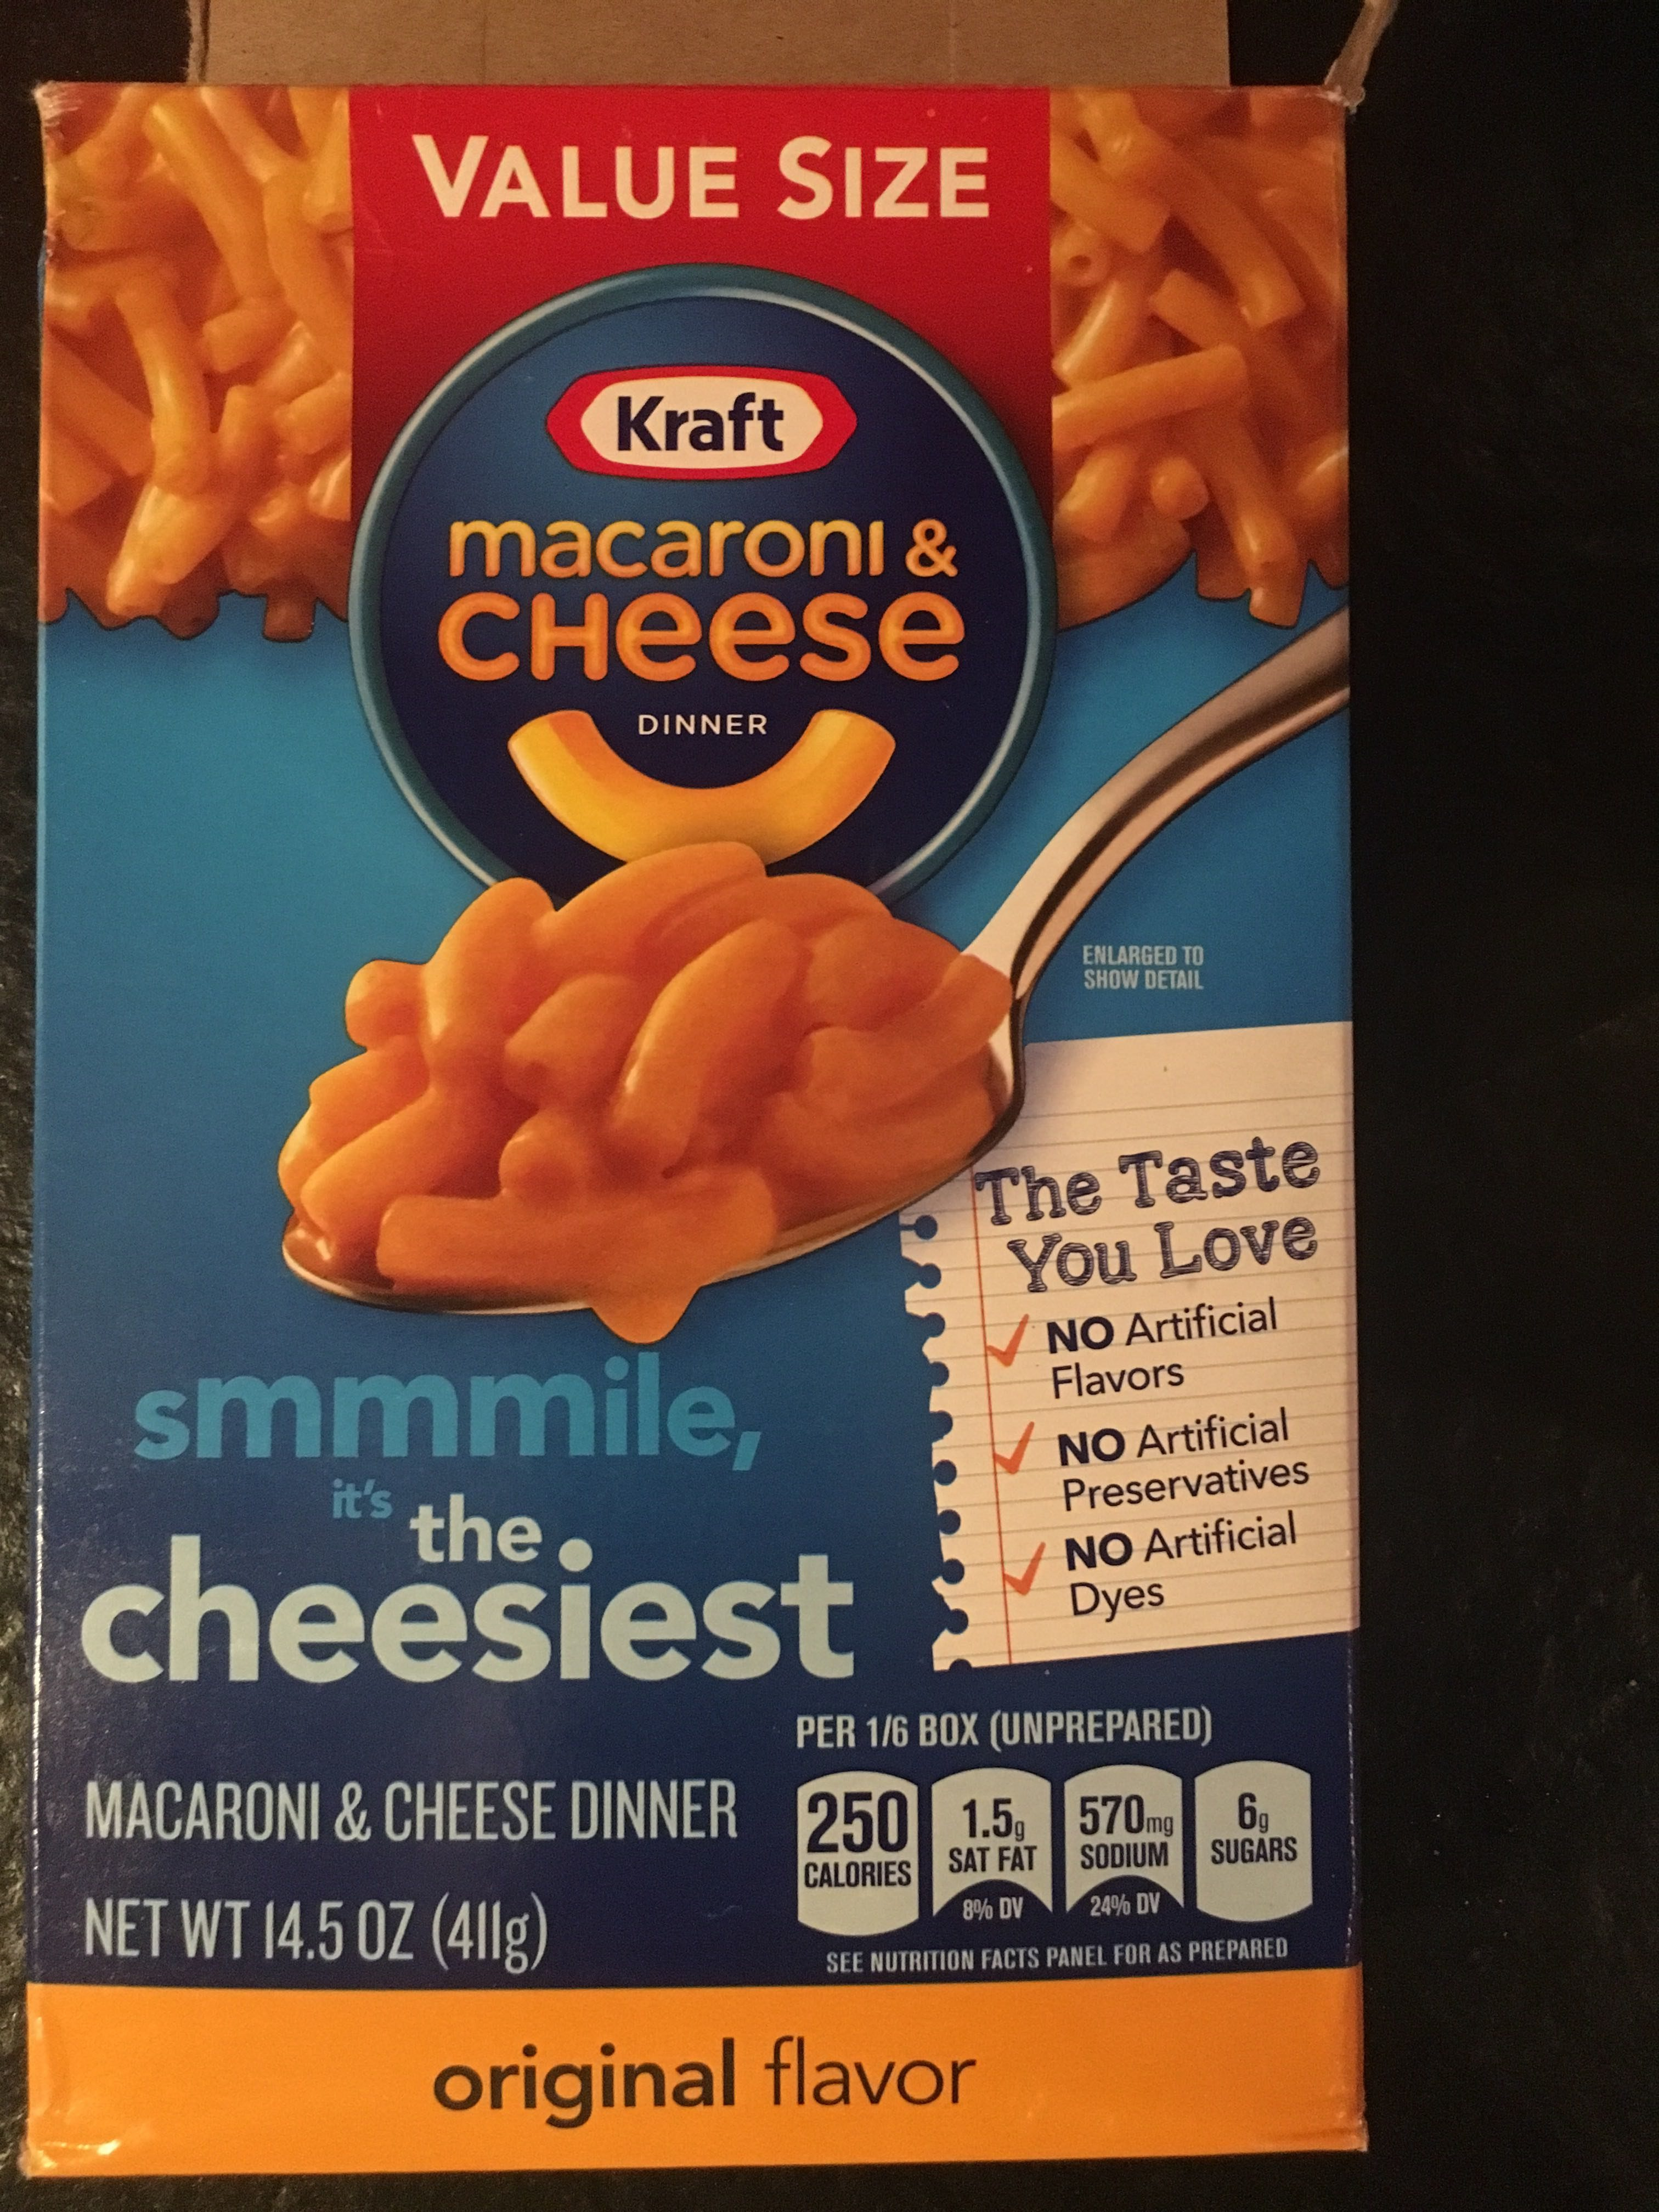 Kraft Original Flavor Macaroni & Cheese - Produit